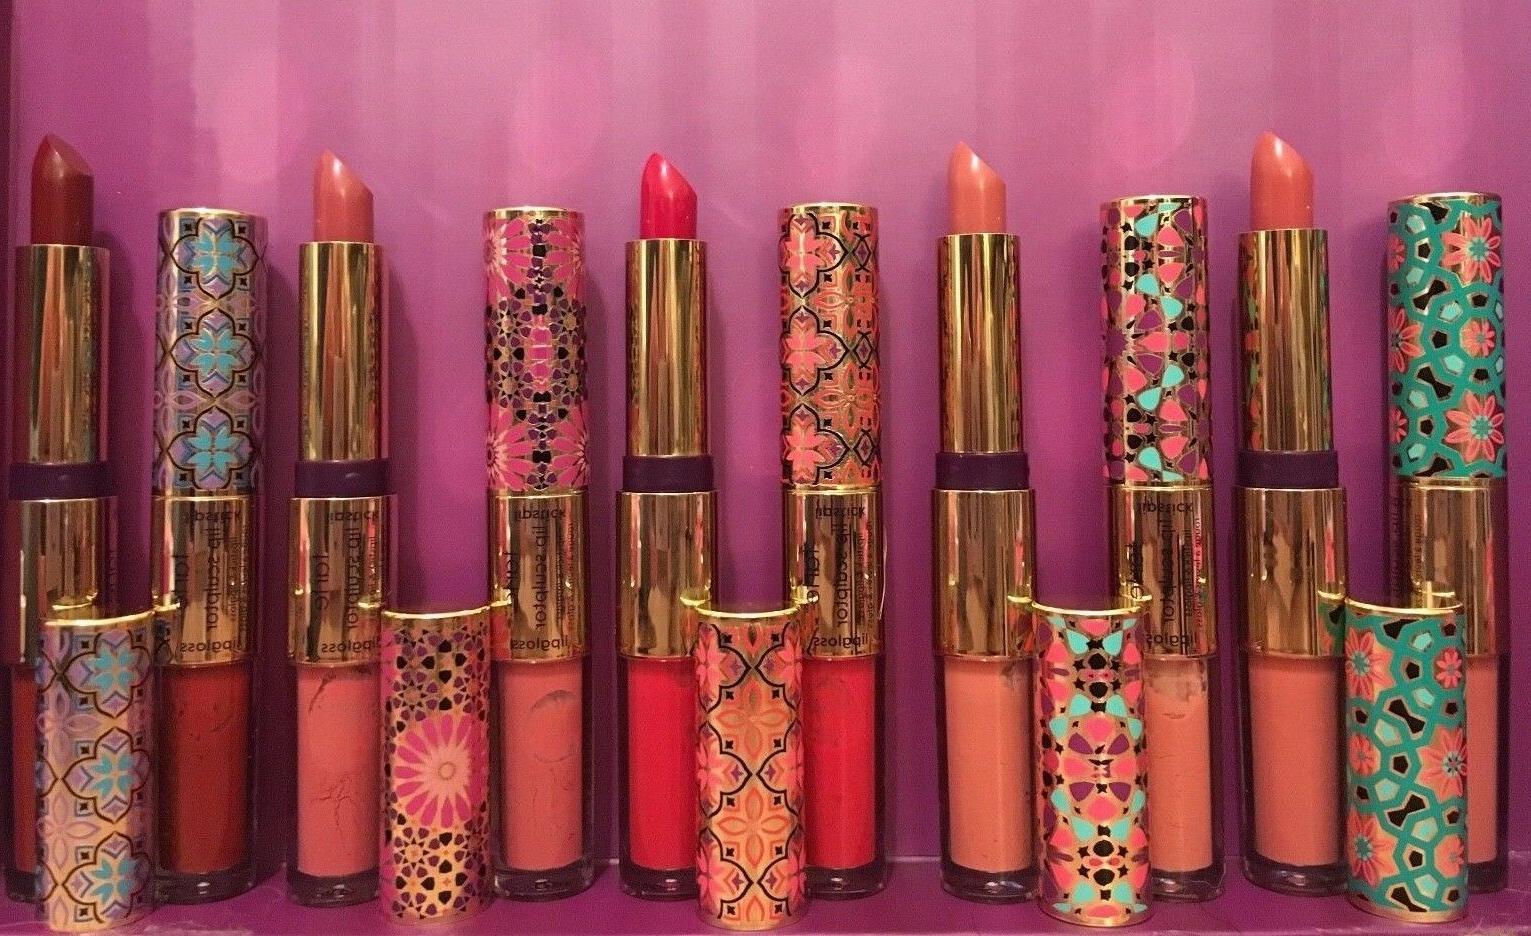 Tarte Lip Sculptor Lipstick & Lip Gloss Double Sided Travel